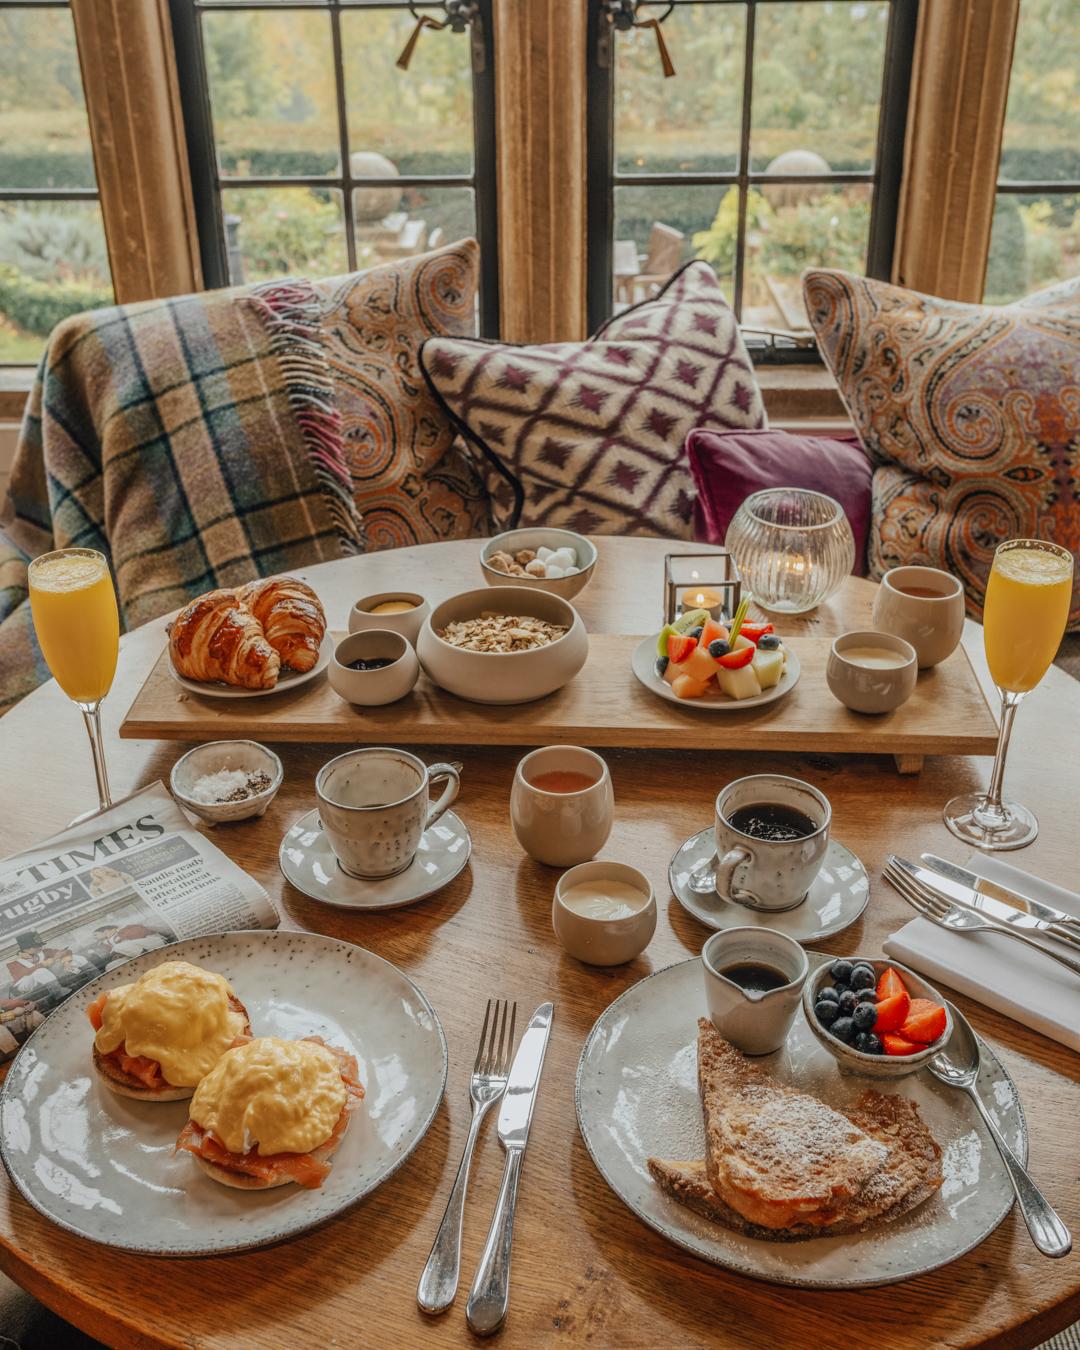 Foxhill_Breakfast.JPG